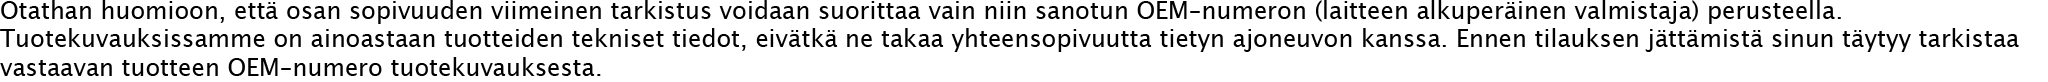 DENSO 56006240, 90048-51164A, 99906-910X9006, 99906-910X9028, NDIK16 Sytytystulppa